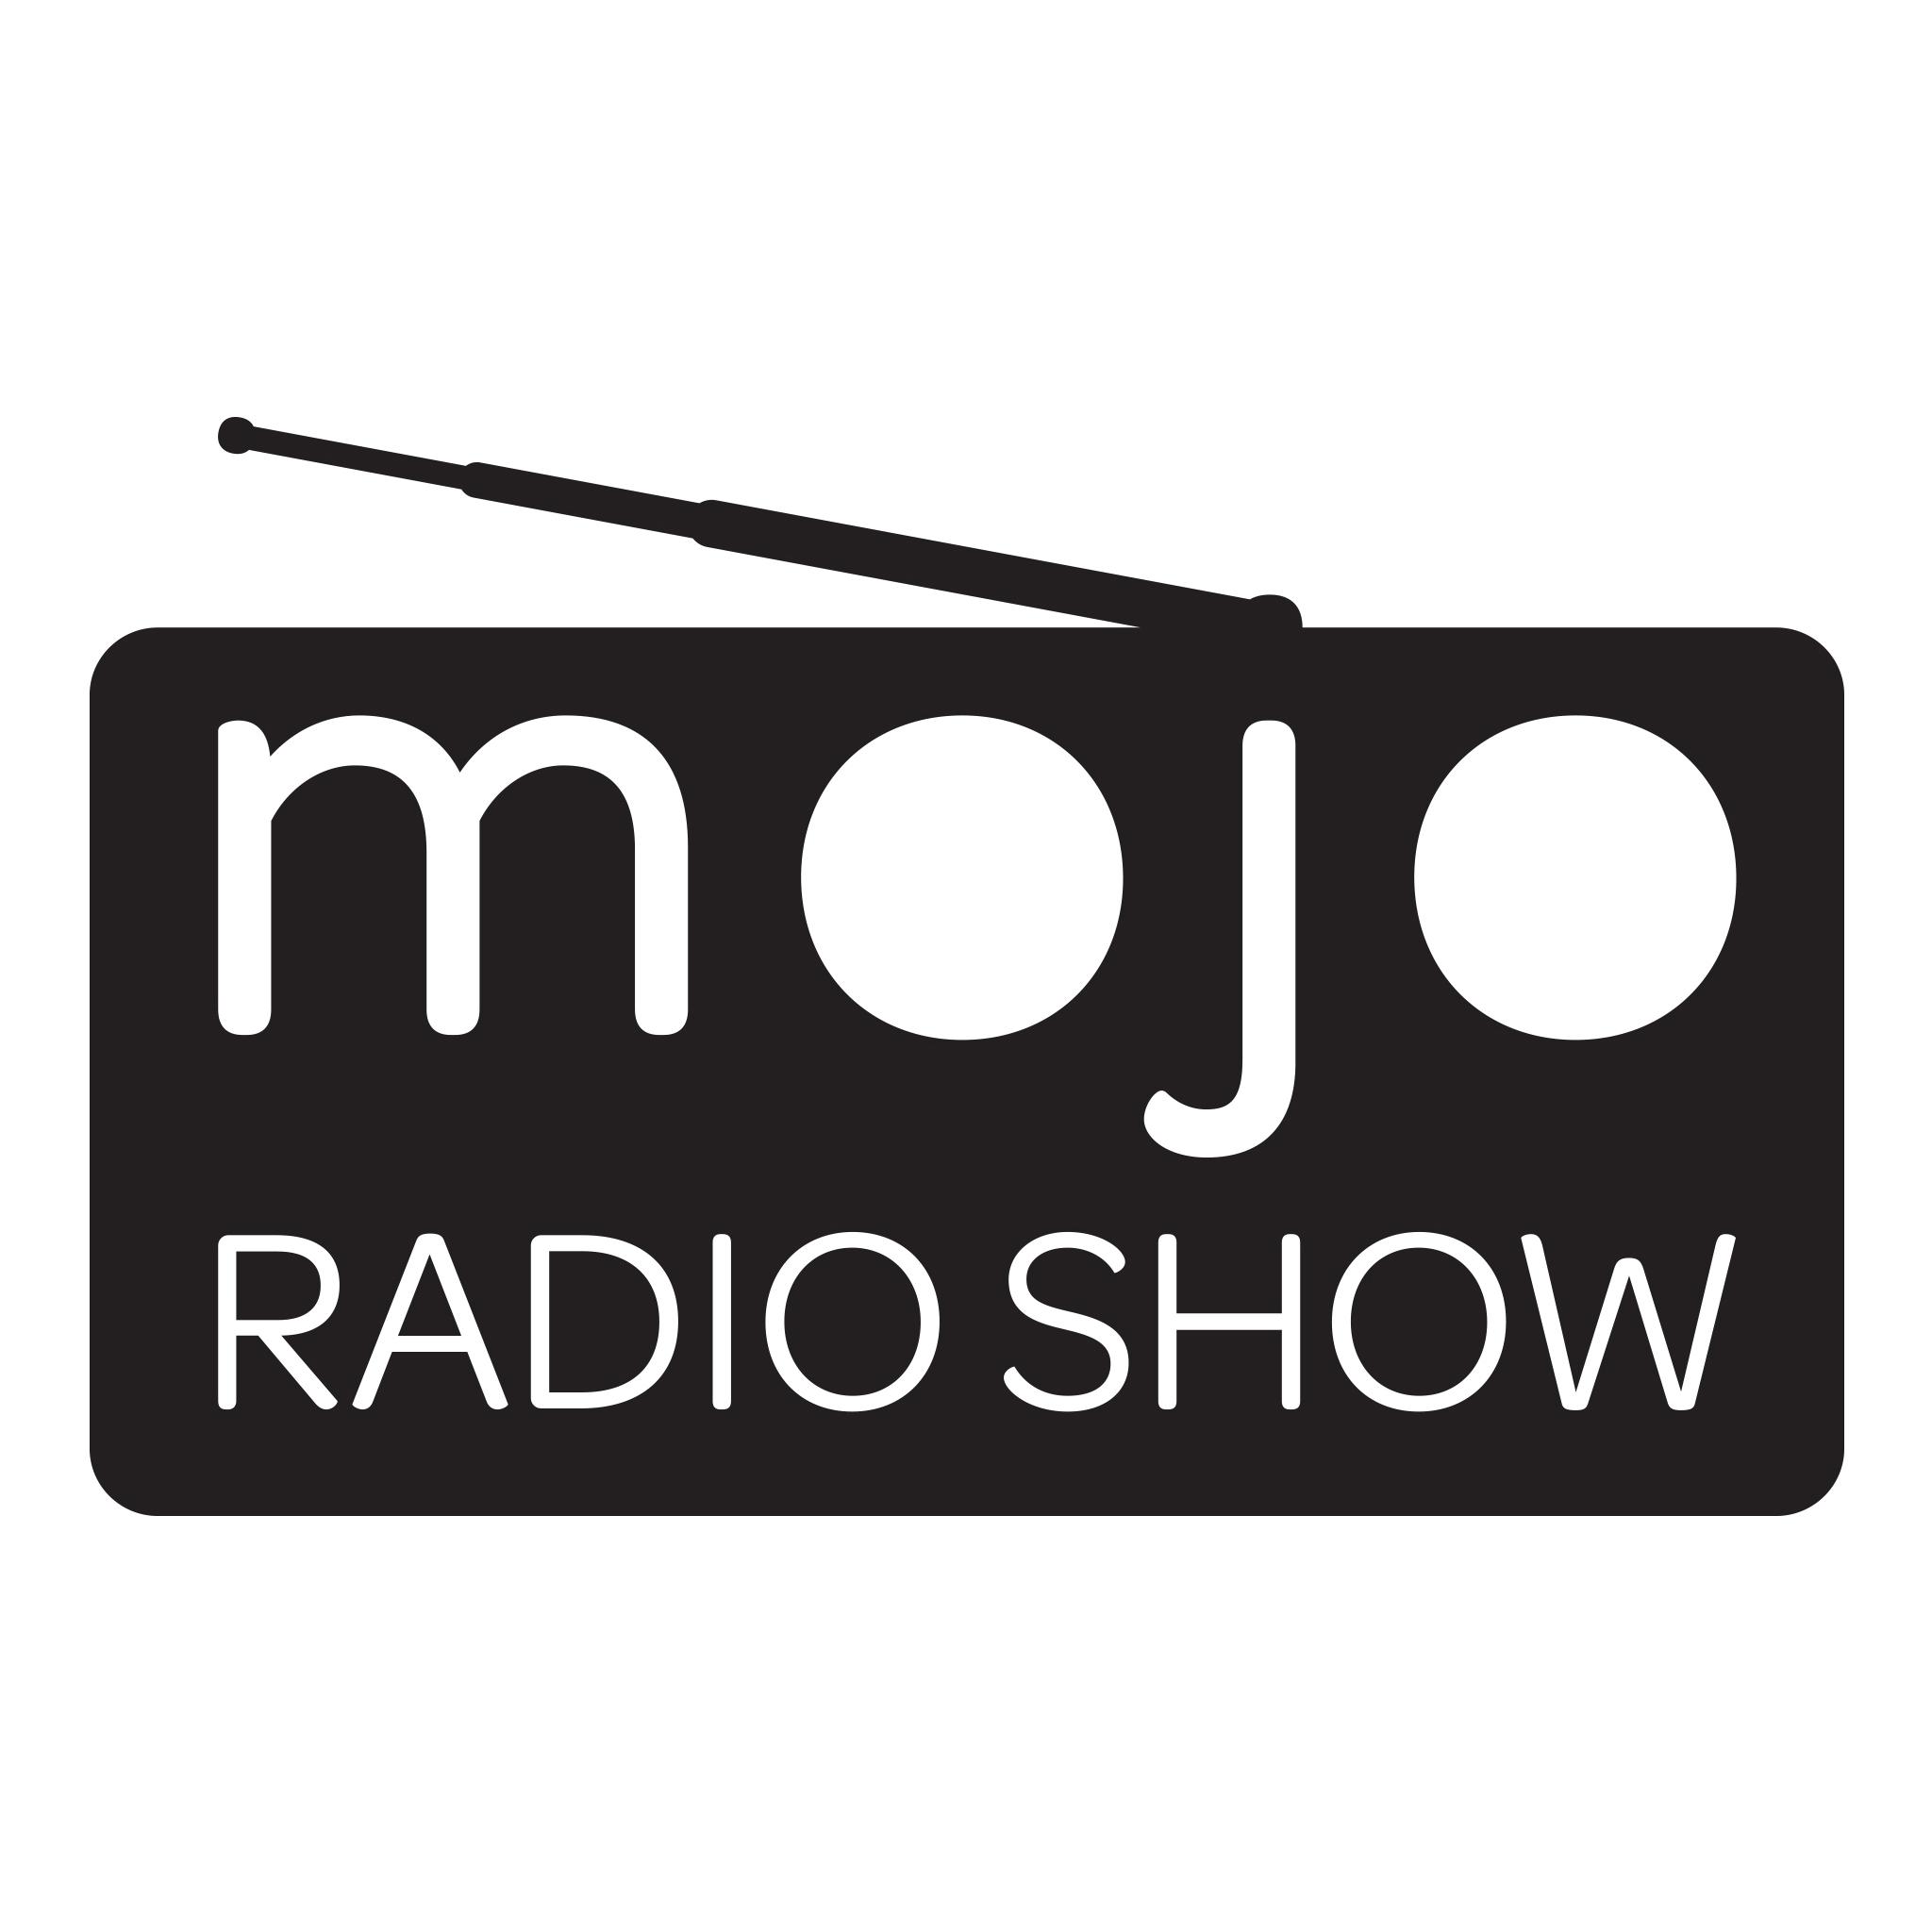 The Mojo Radio Show show art